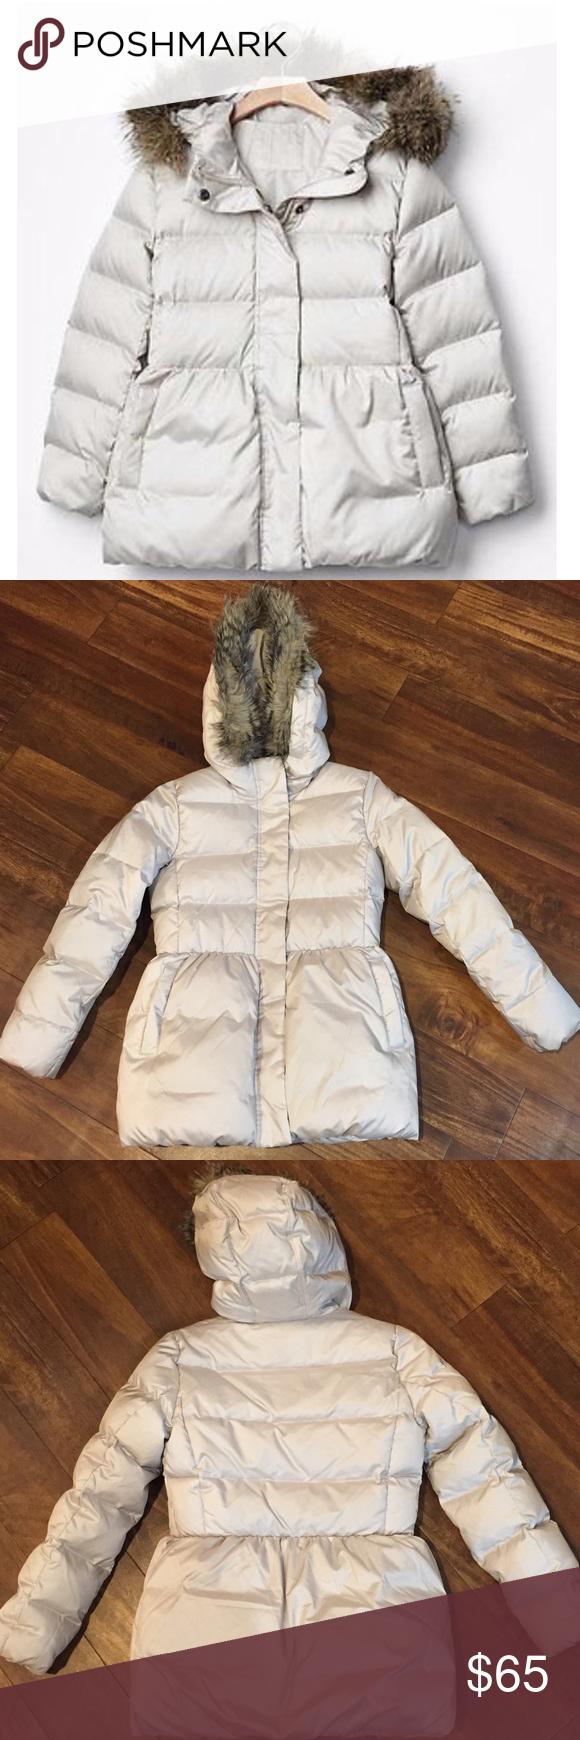 Gap Kids Girls Down Bubble Puffer Jacket Size Xl Gap Kids Girls Clothes Design Jackets [ 1740 x 580 Pixel ]